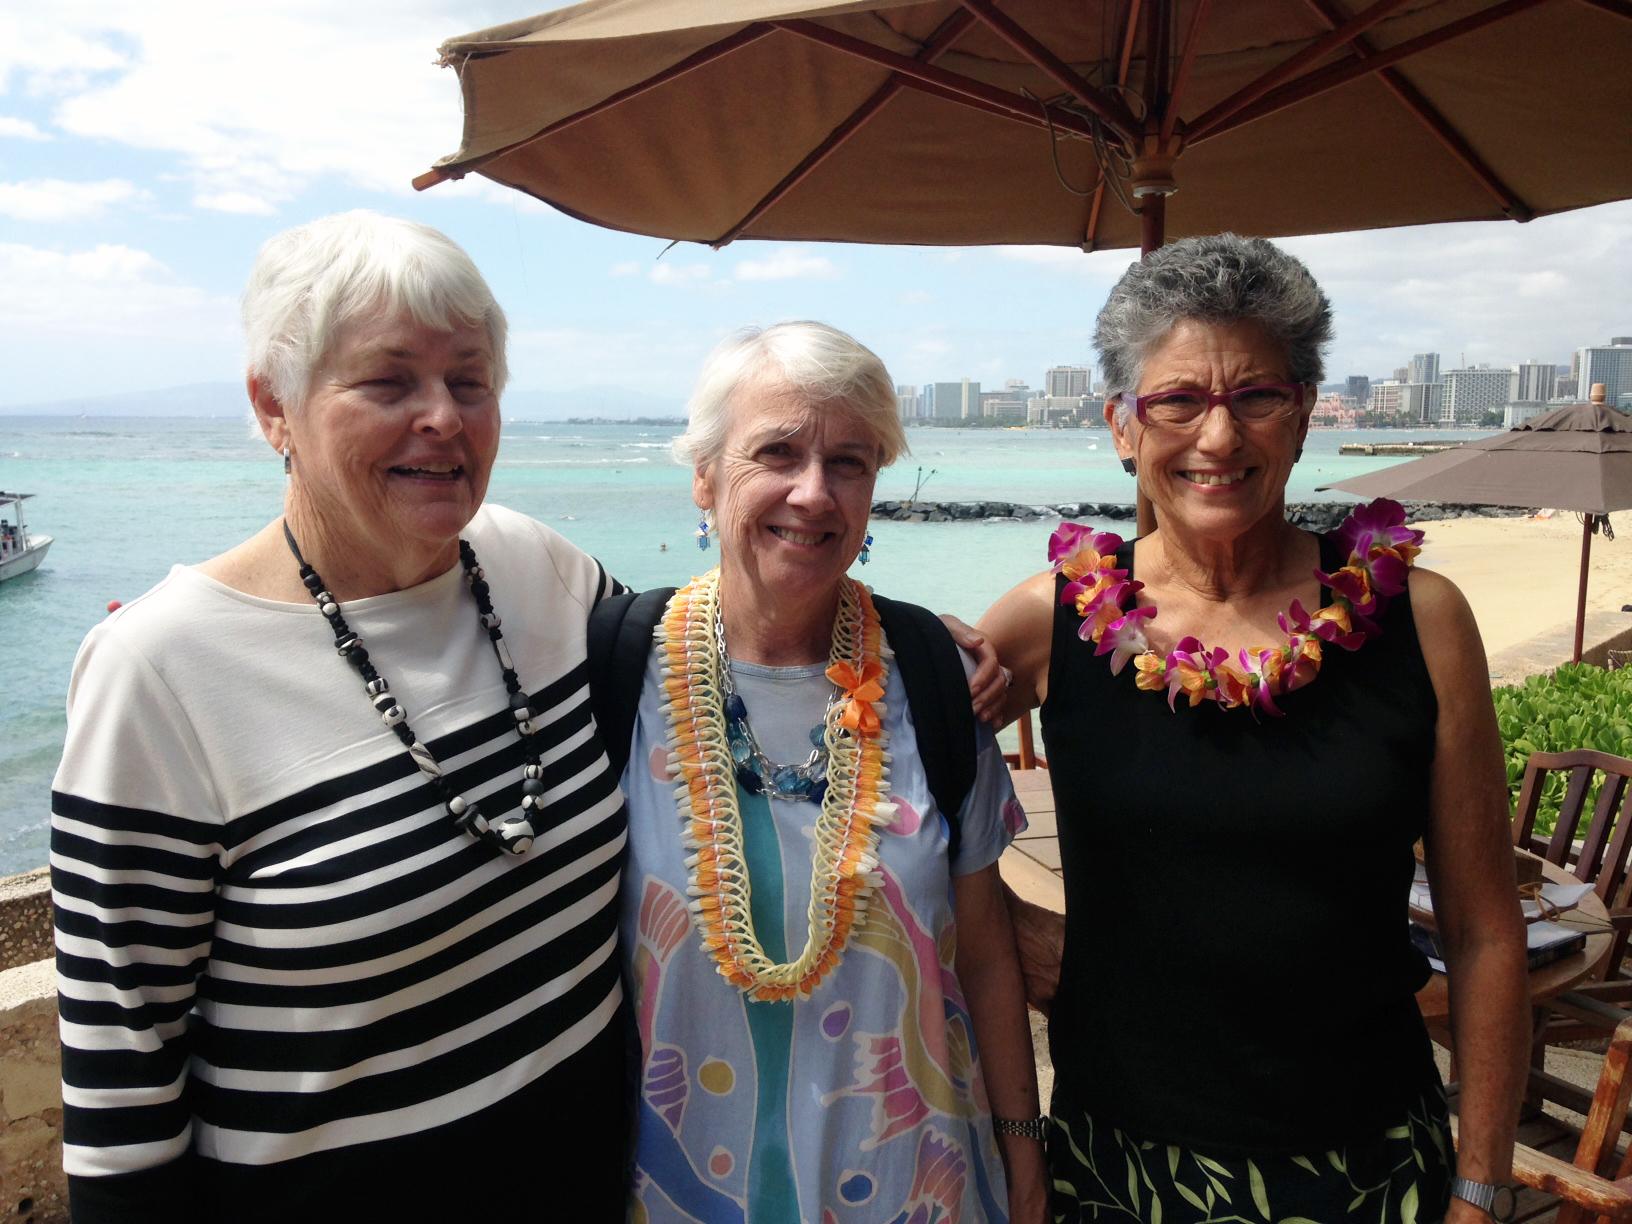 Patty Lee, Philomene Verlaan and Sui-Lan Ellsworth in Waikiki